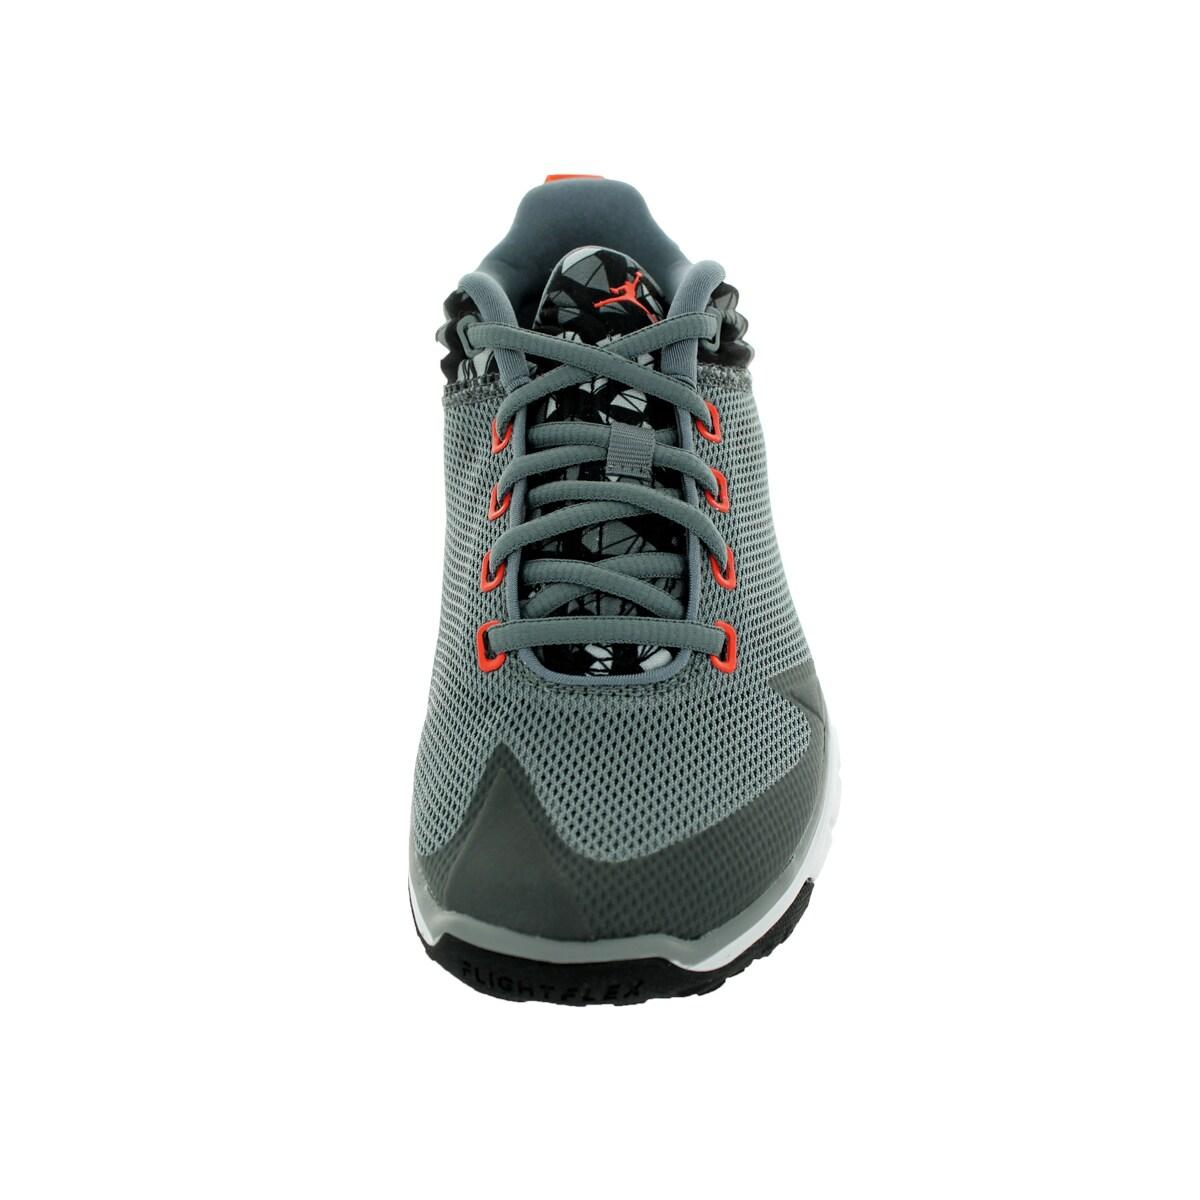 a34fe10120a74 Nike Jordan Kid's Jordan Flight Flex Trainer Bg Cool Grey/Tm Orange/White  Training Shoe